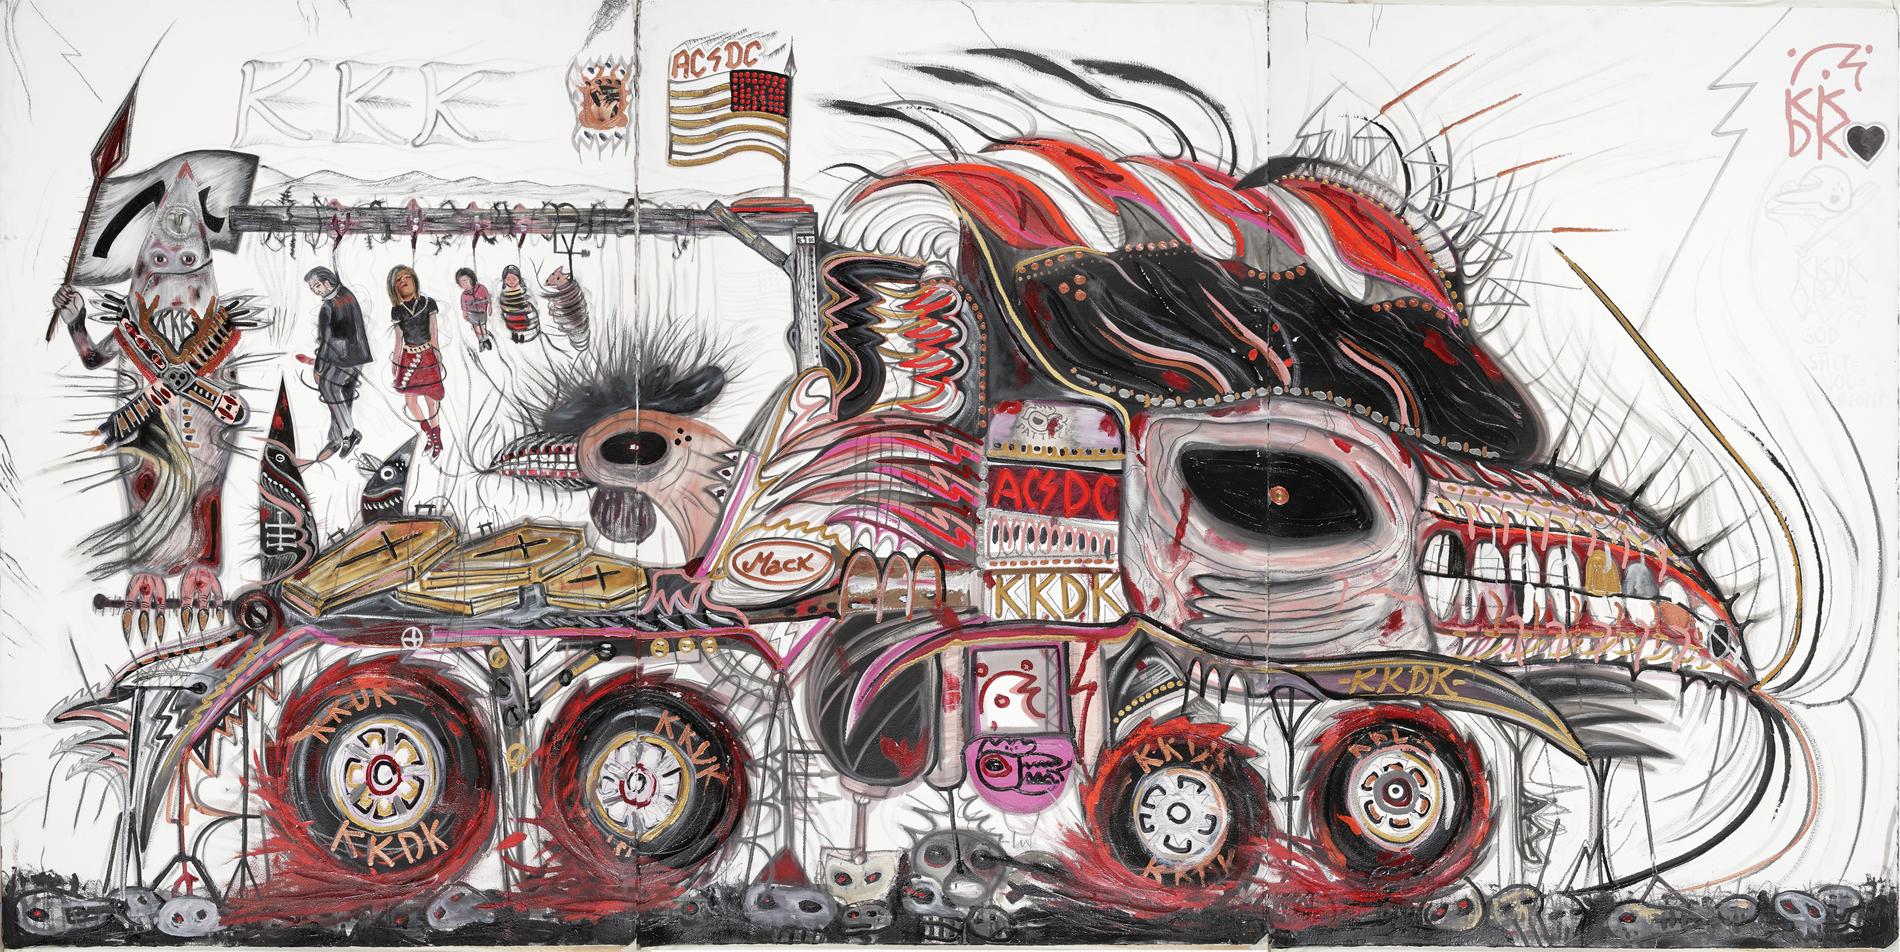 Philip Guston Cars. Abdul Vas. American Truck. Pettricca Blanca 14700-KKDK Inc-MACK, 2004. William Burroughs, City of Bohane, Kevin Barry.